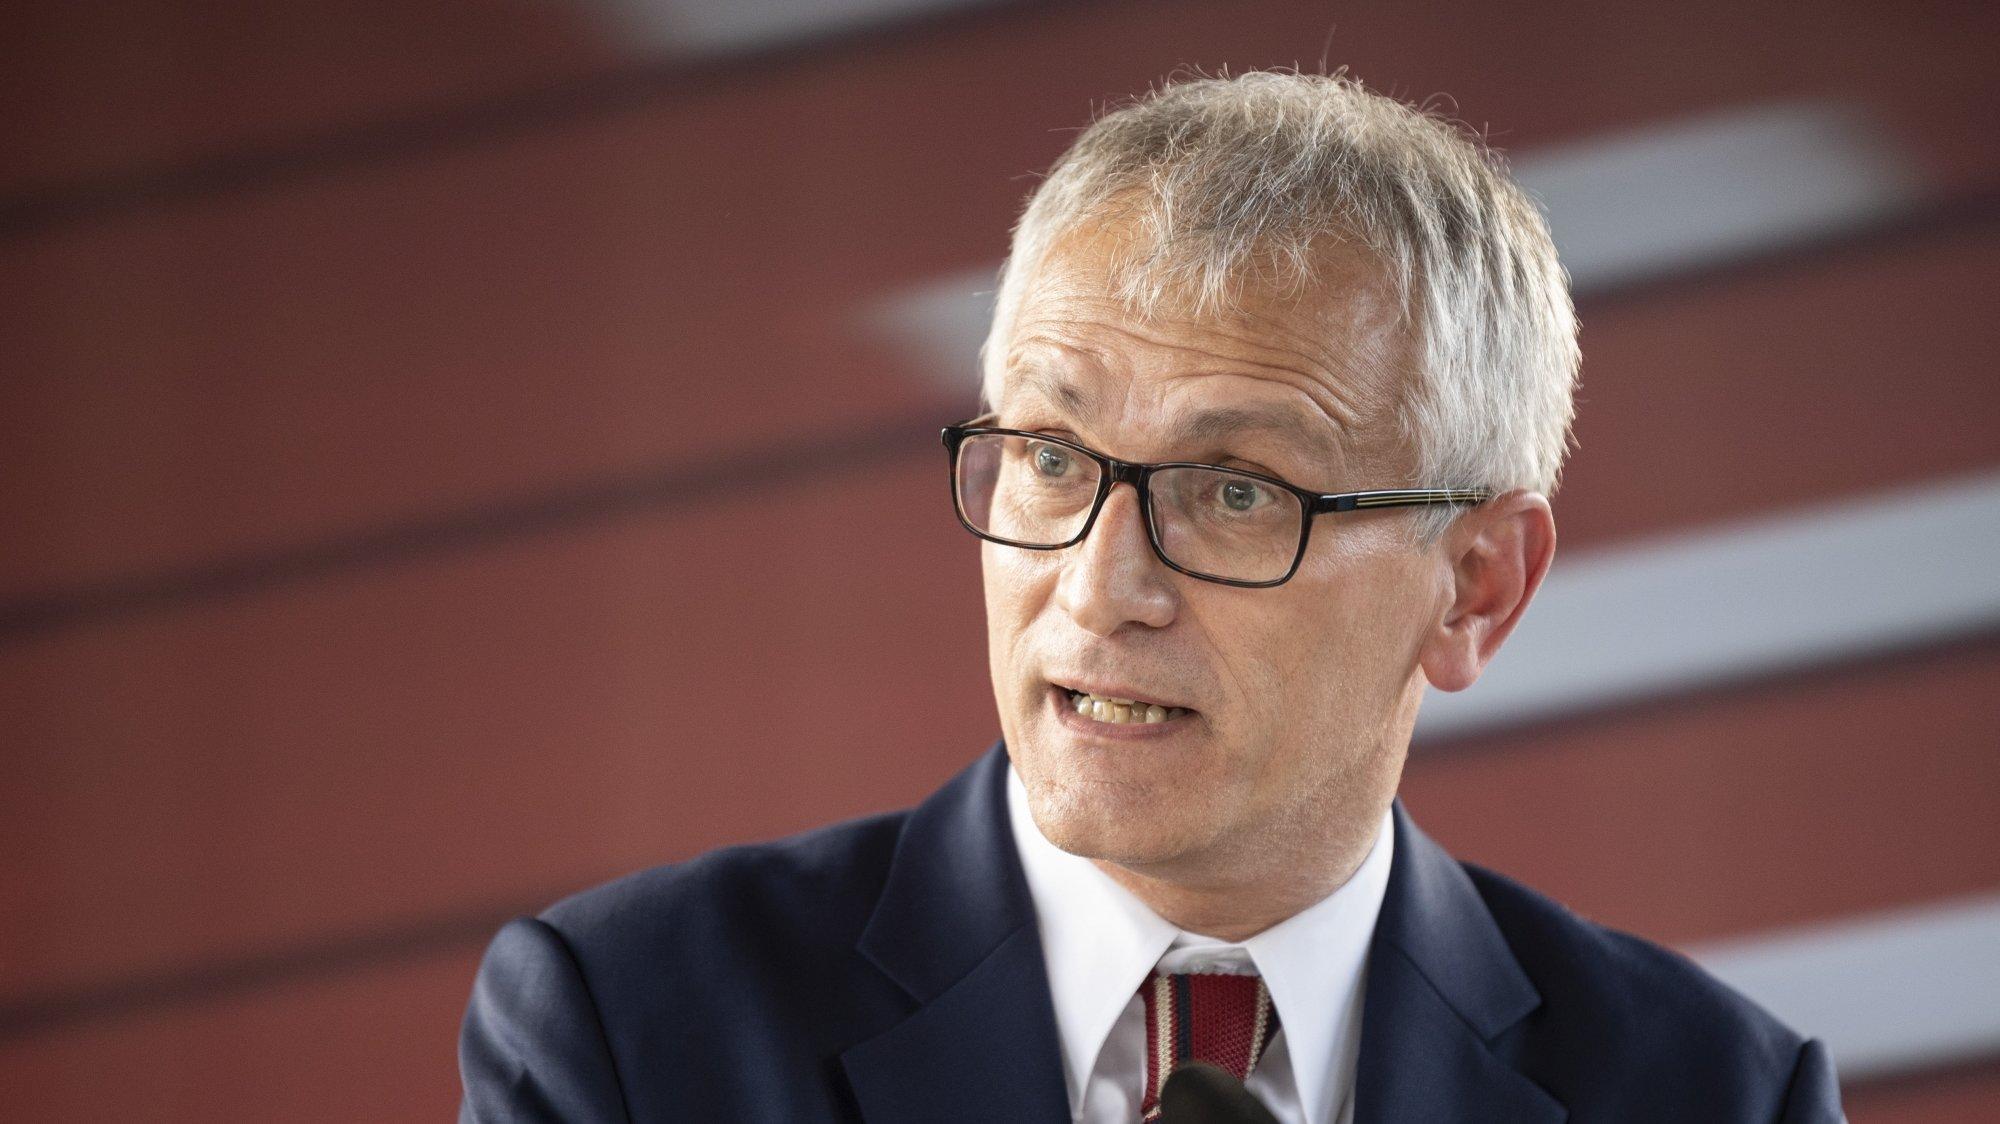 Alberto Mazzola parle du «Connecting Europe Express (CEE)» à Berne, le lundi 27 septembre.